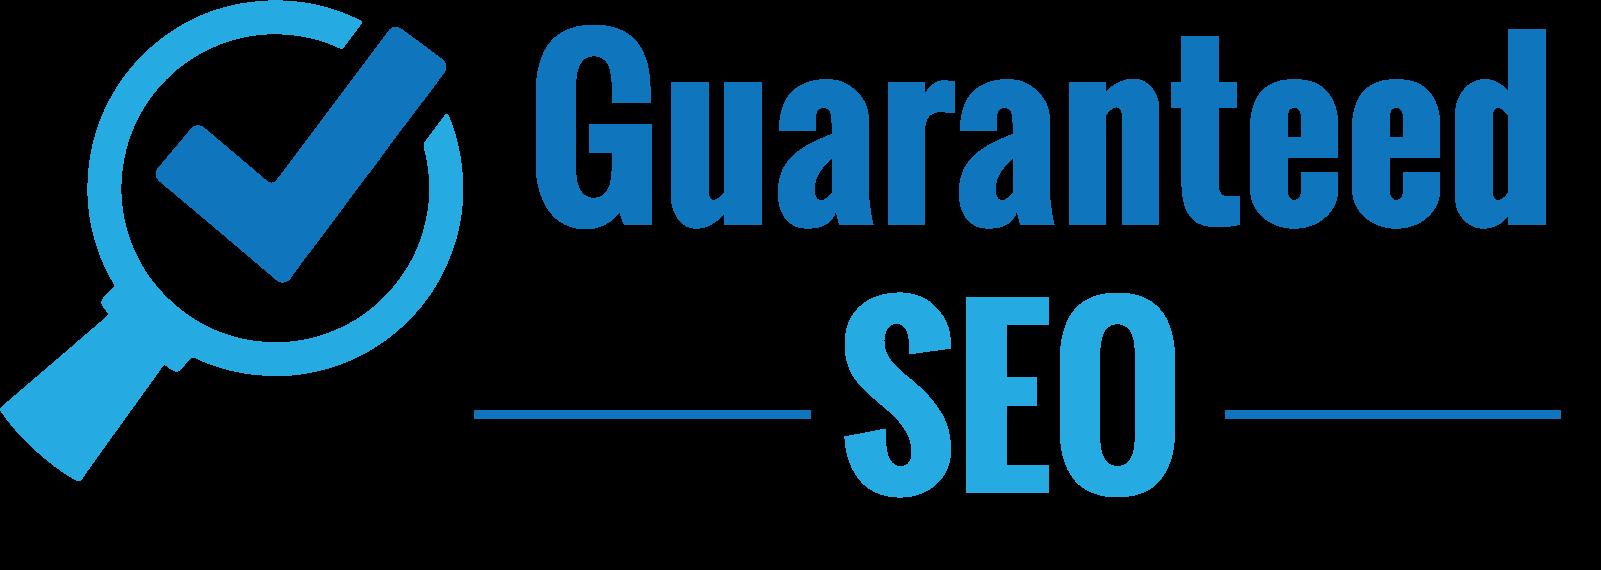 Guaranteed SEO